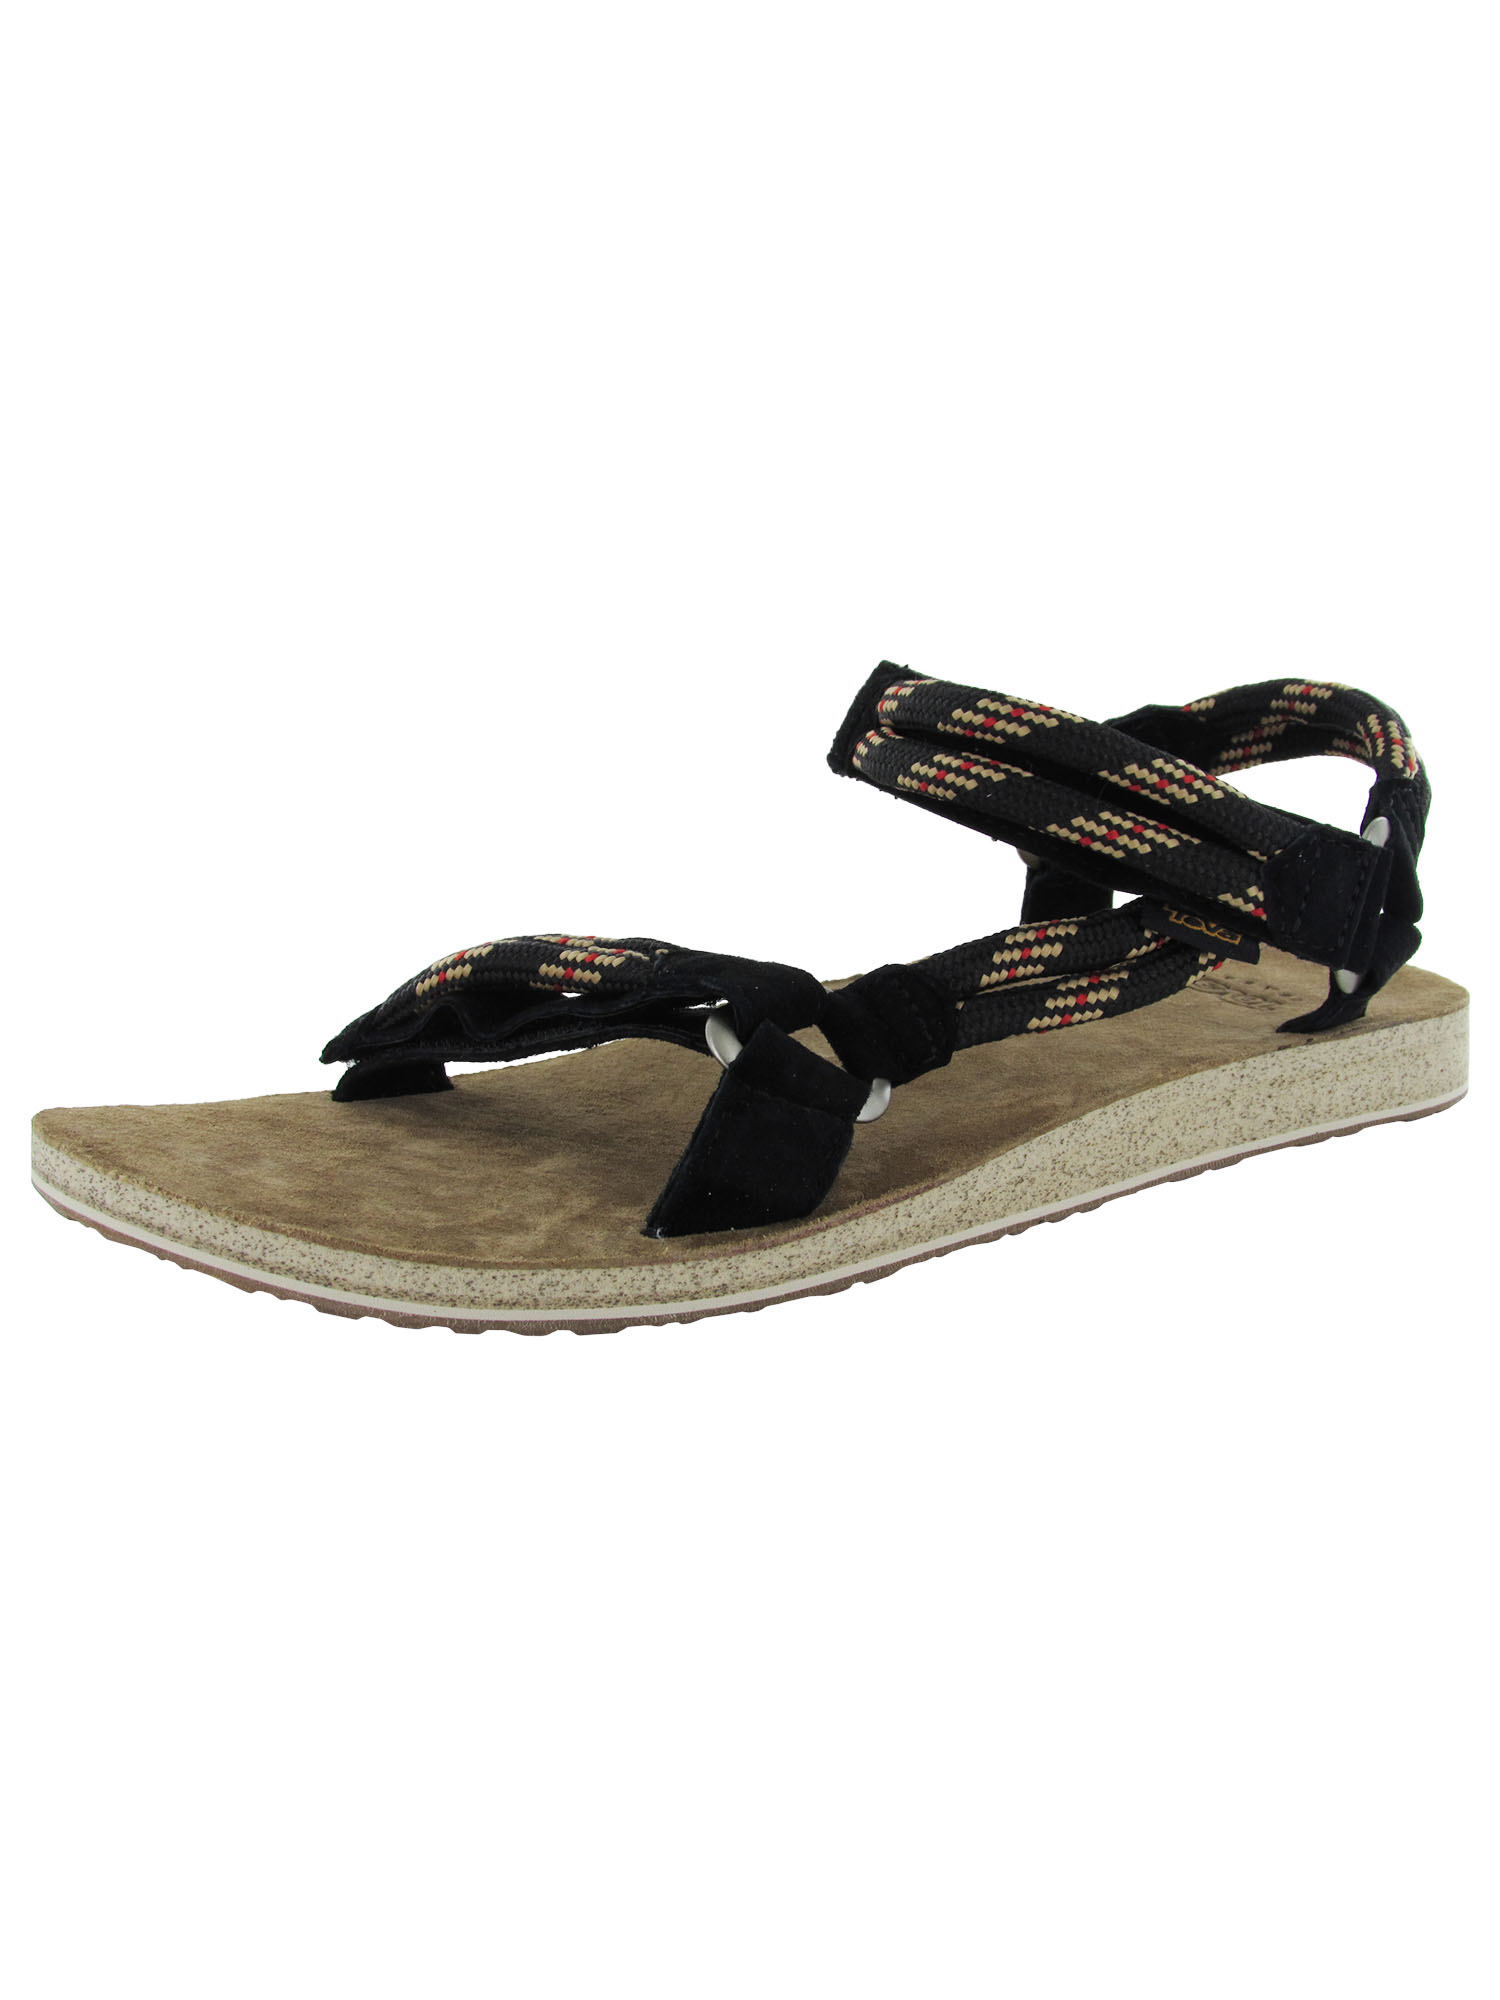 a8fee8f30 Teva Men s Original Universal Rope Sport Sandal Black Size 13 M